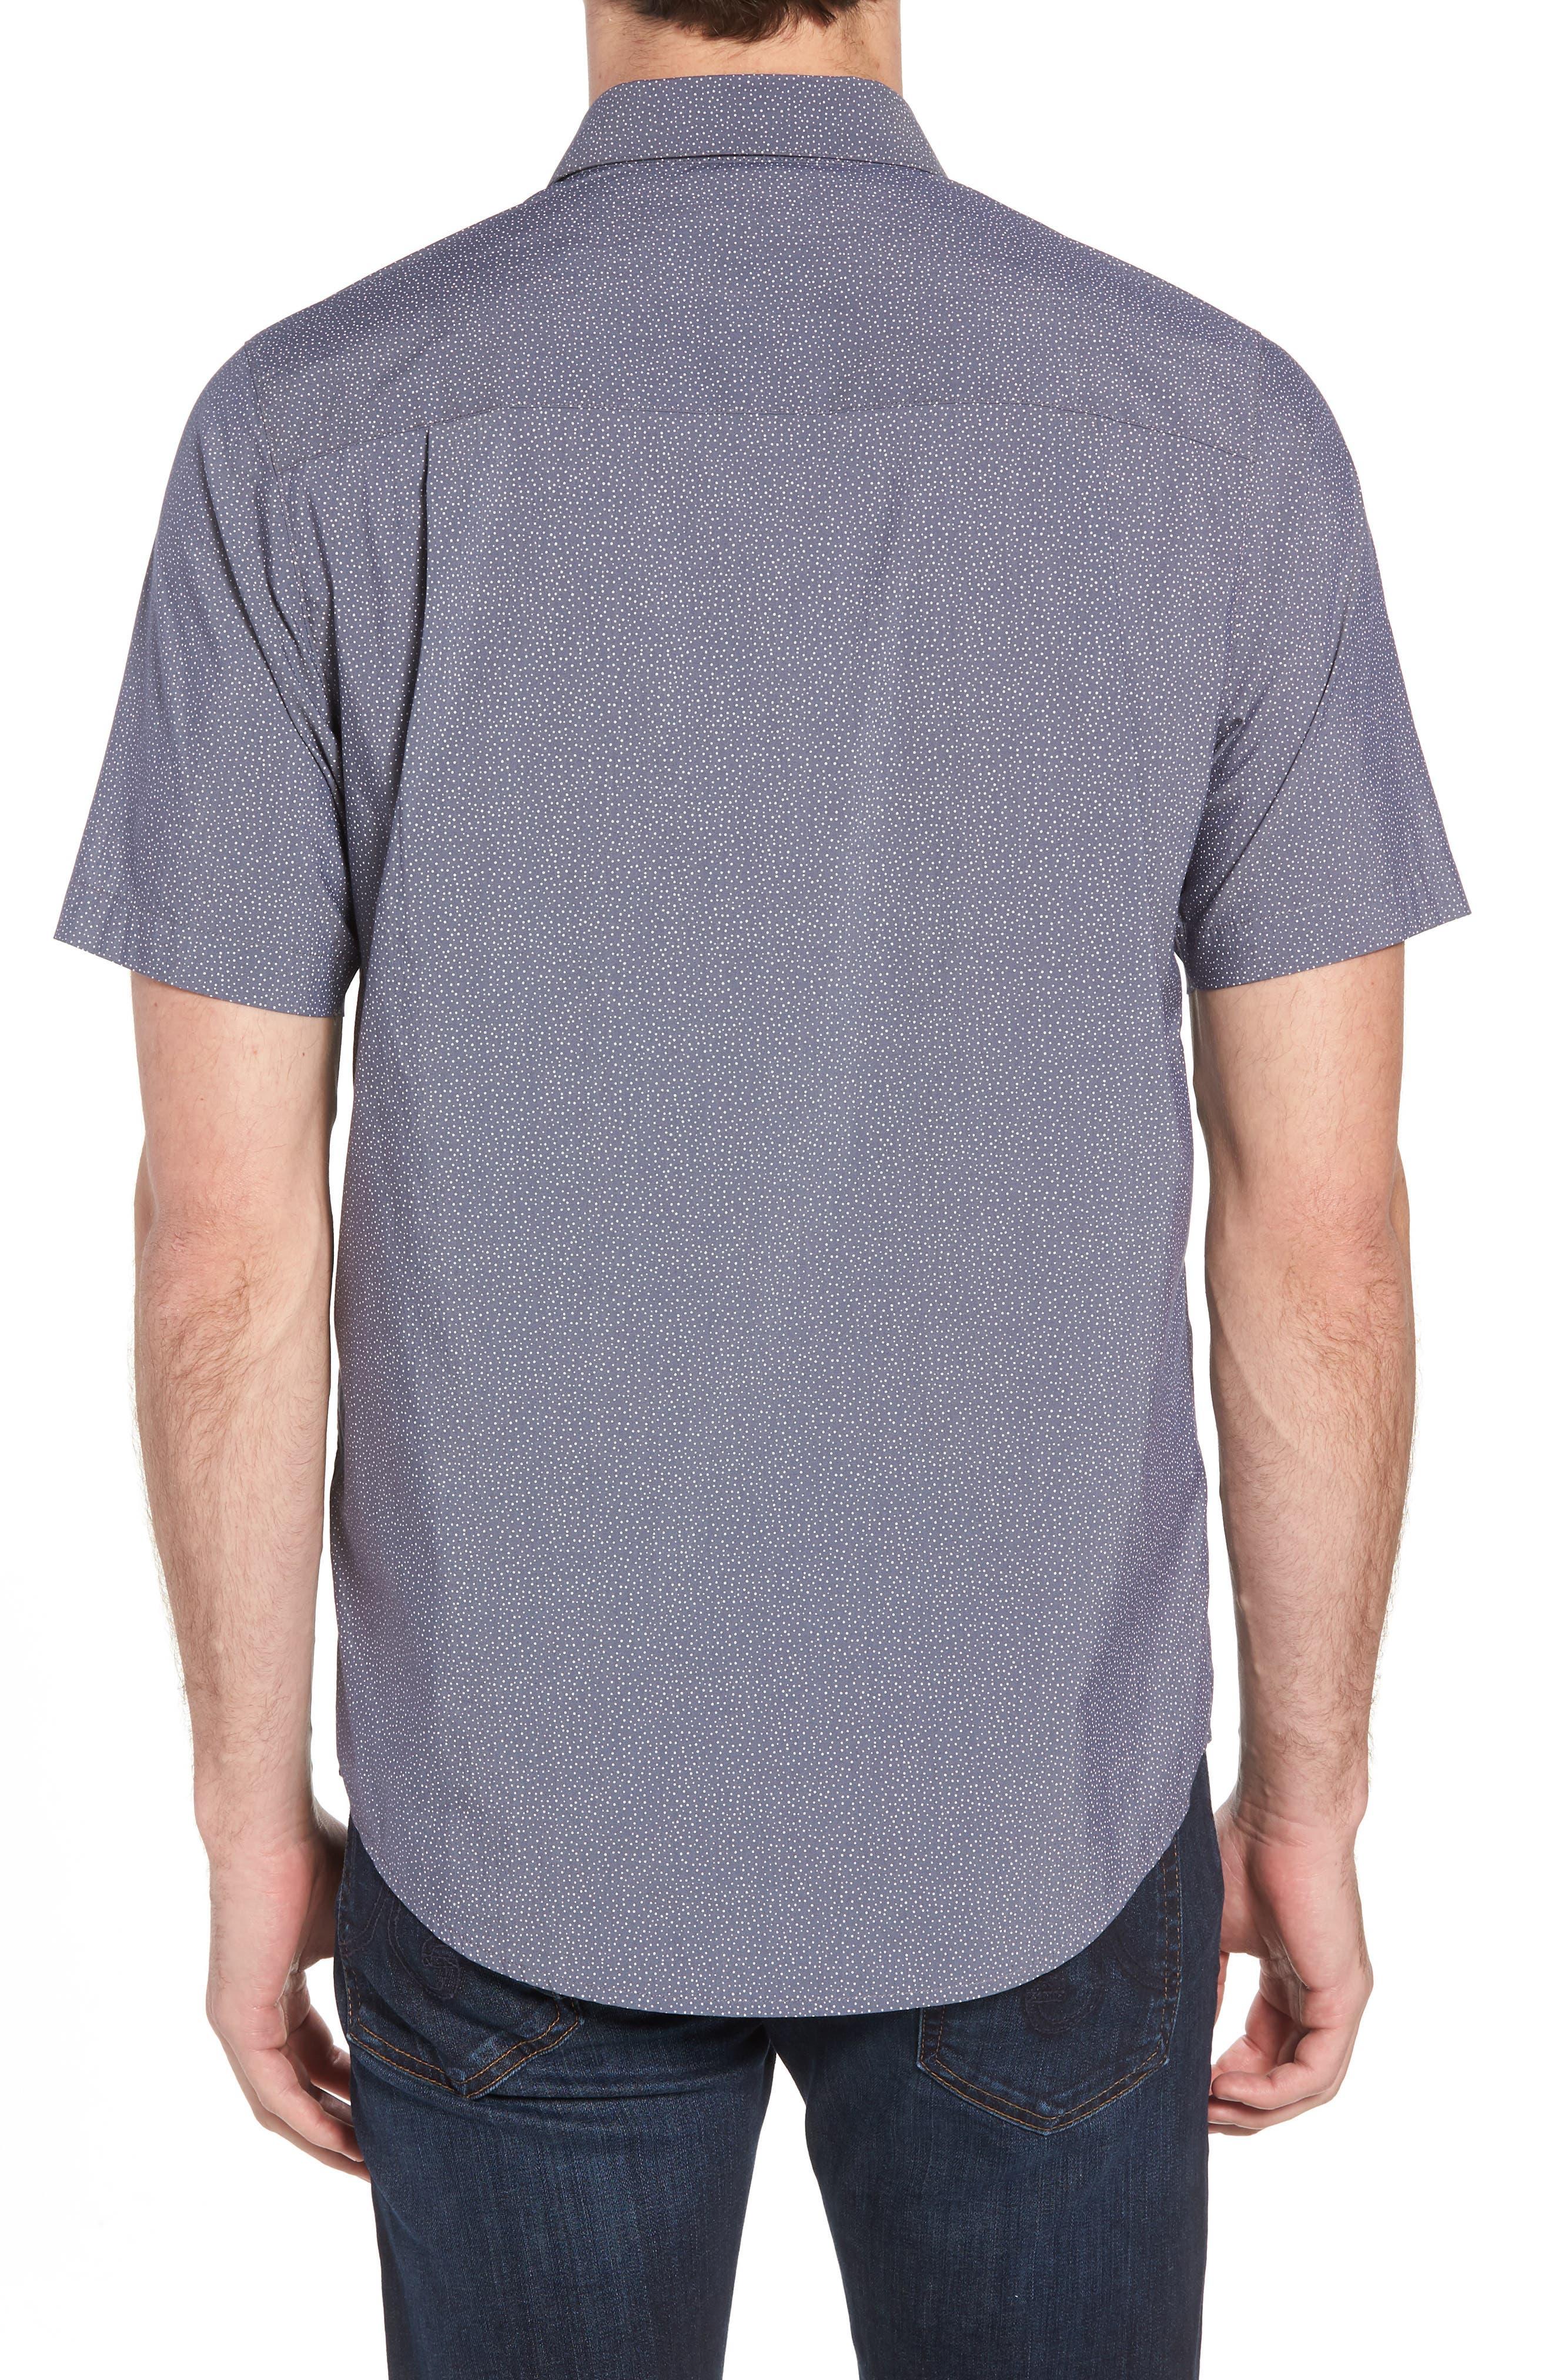 Particles Spot Print Sport Shirt,                             Alternate thumbnail 3, color,                             Blue Nights